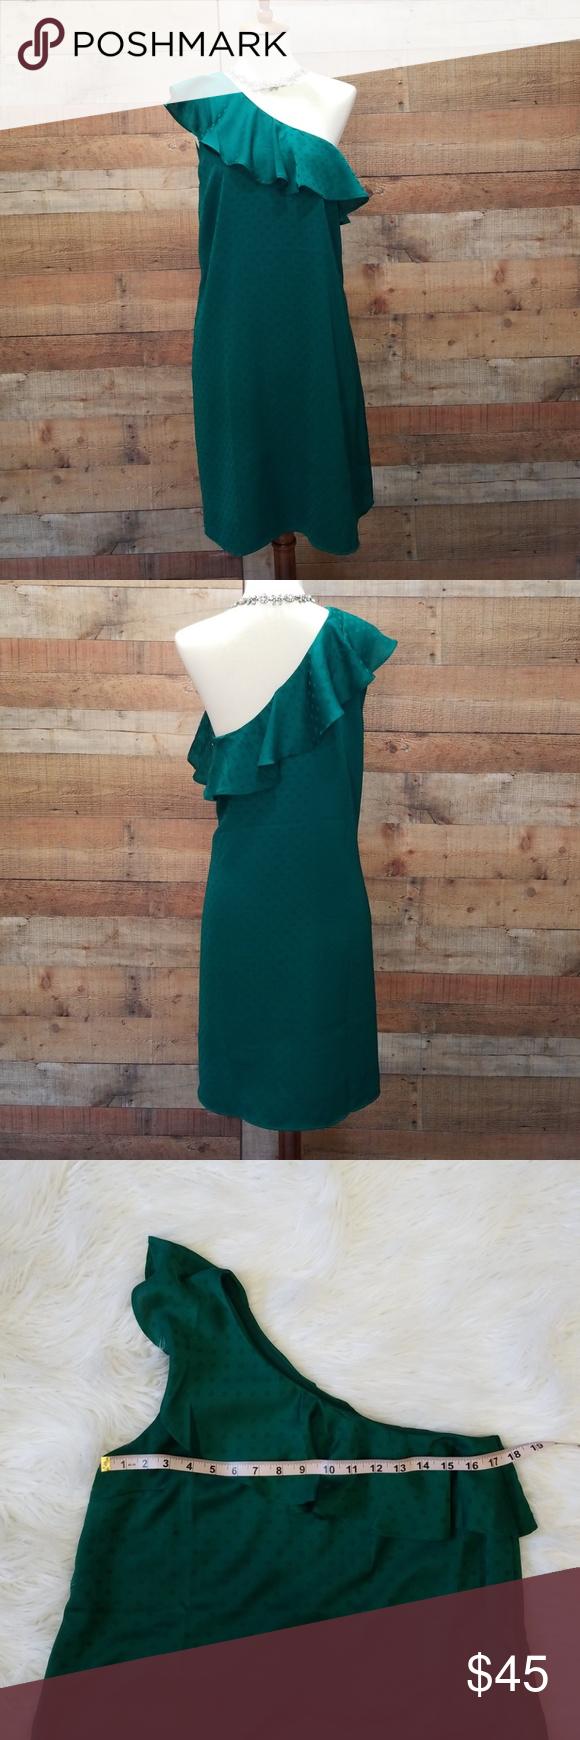 Green dress one shoulder  Loft one shoulder dress NWT  Gorgeous Dresses  Pinterest  Dresses